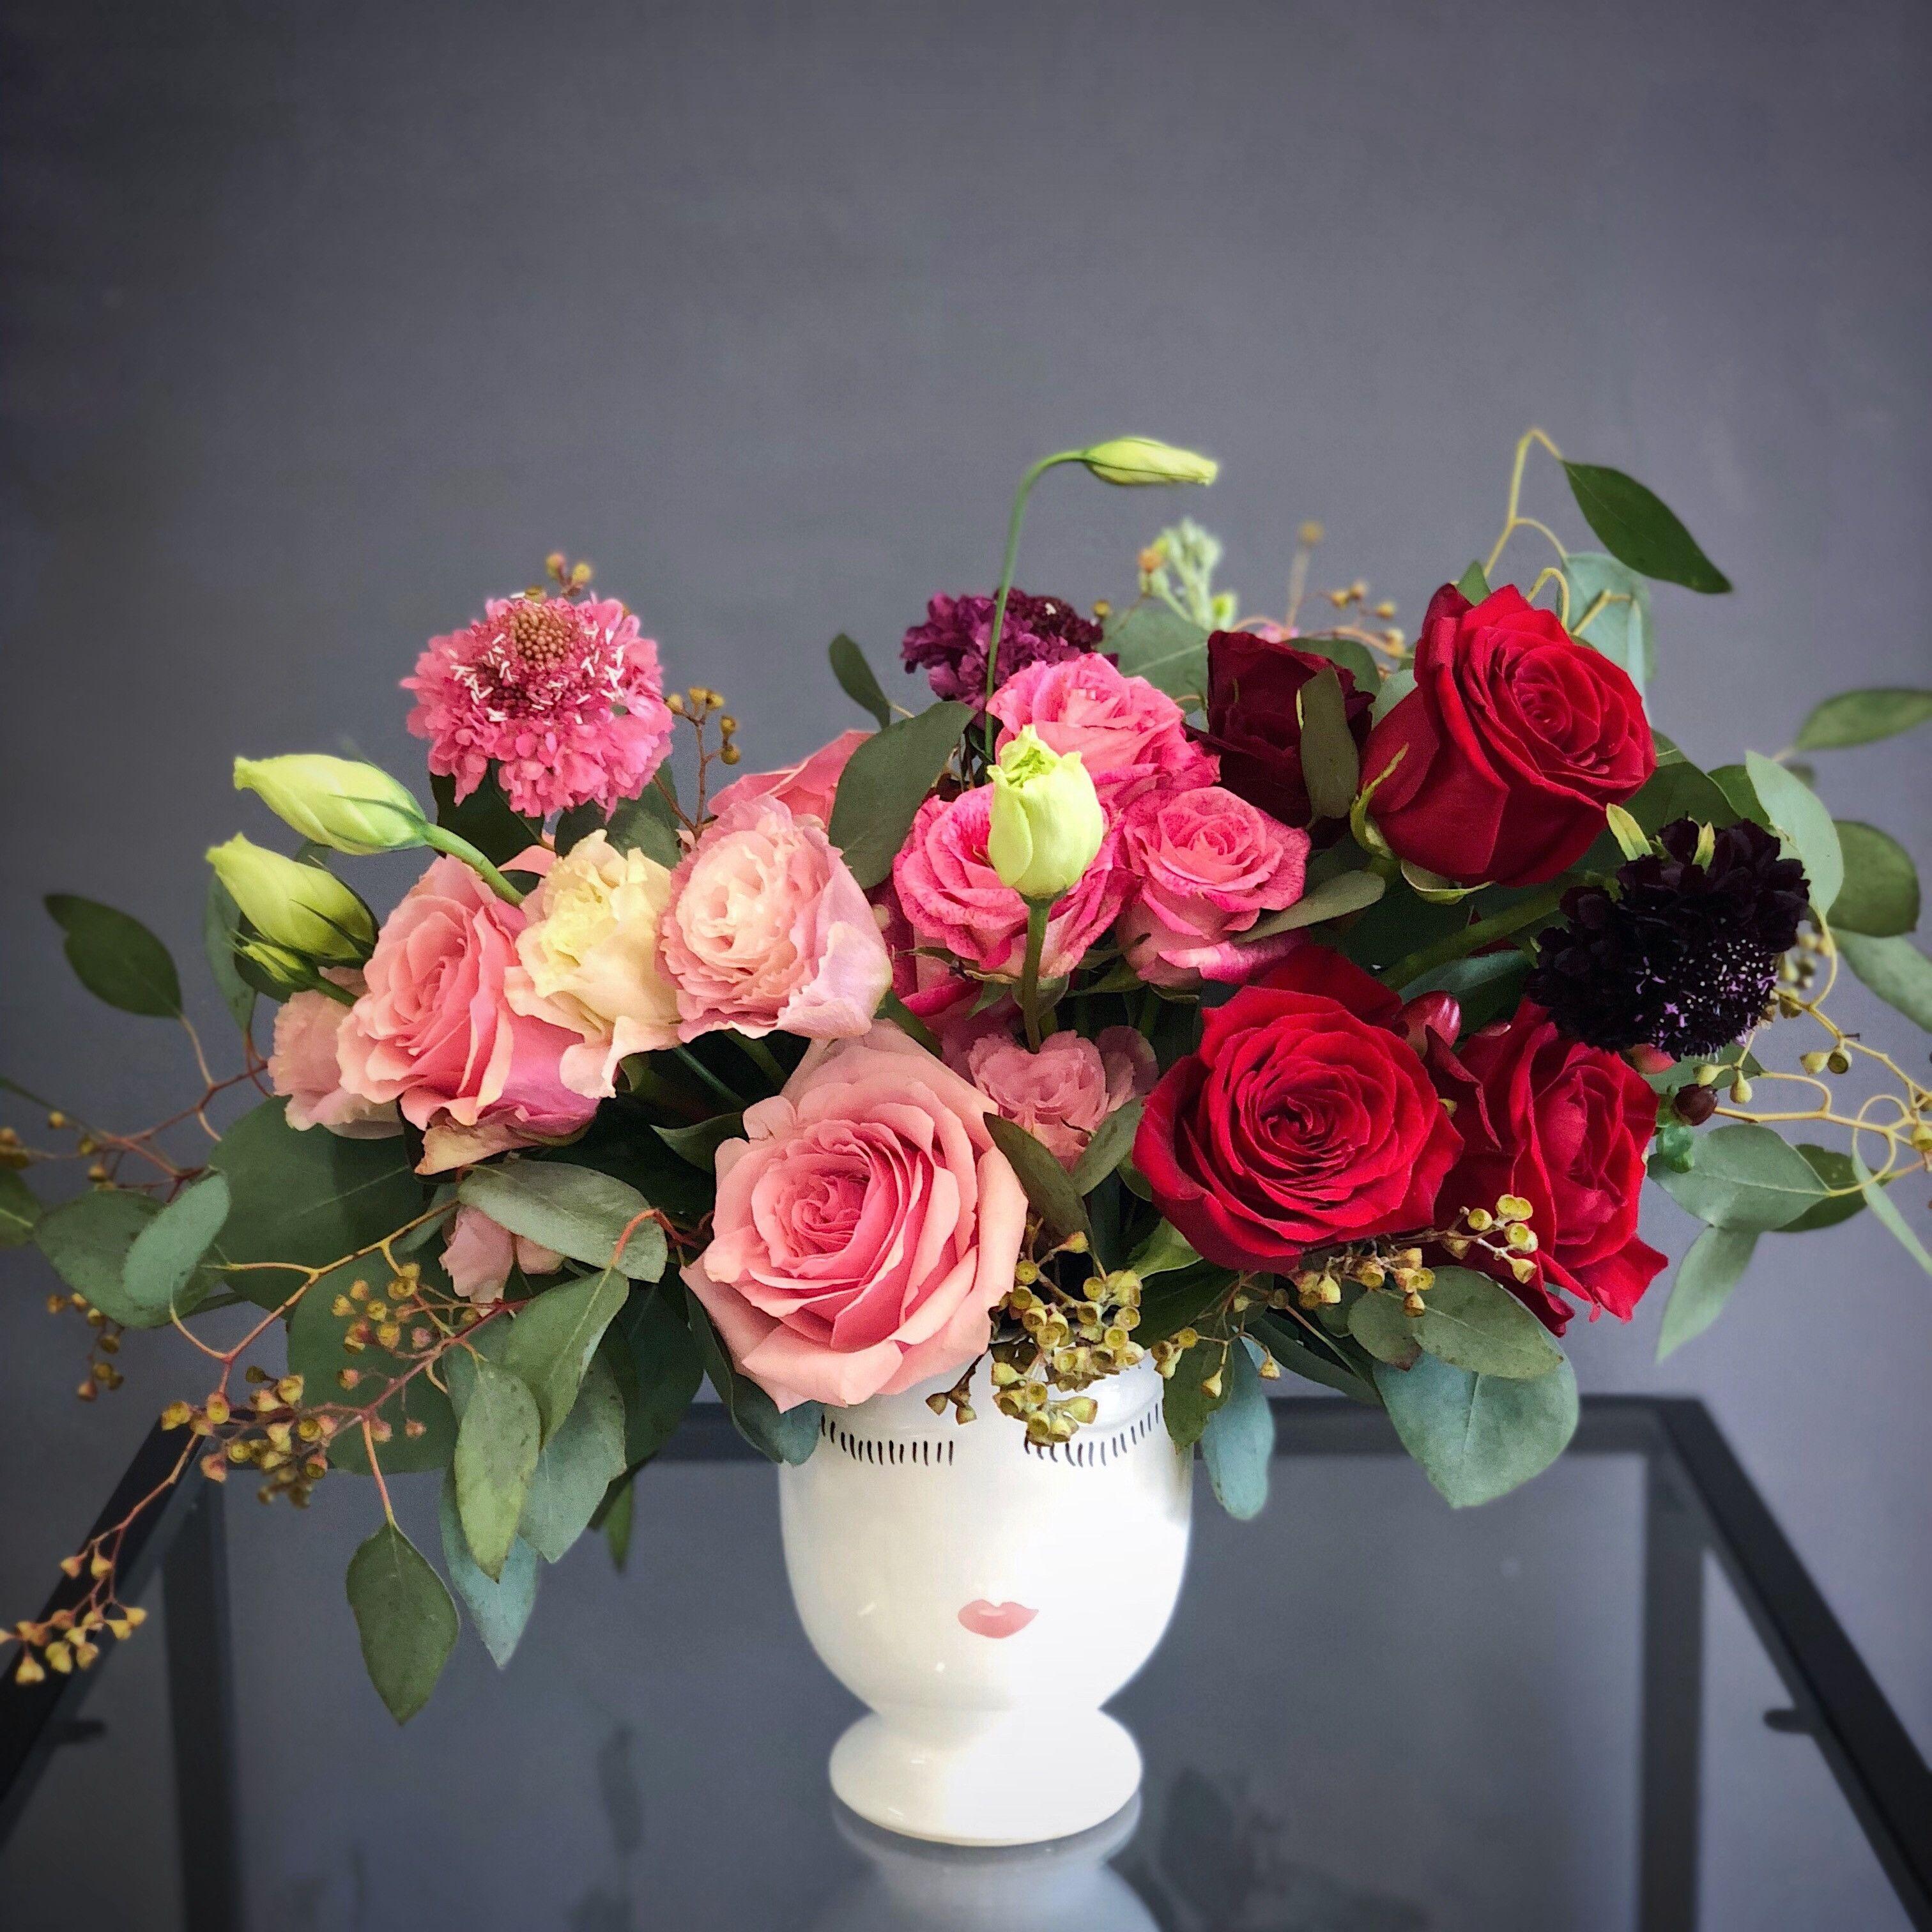 Ombre Garden Style Arrangement 1 Pink Flower Arrangements Flower Arrangements Floral Arrangements